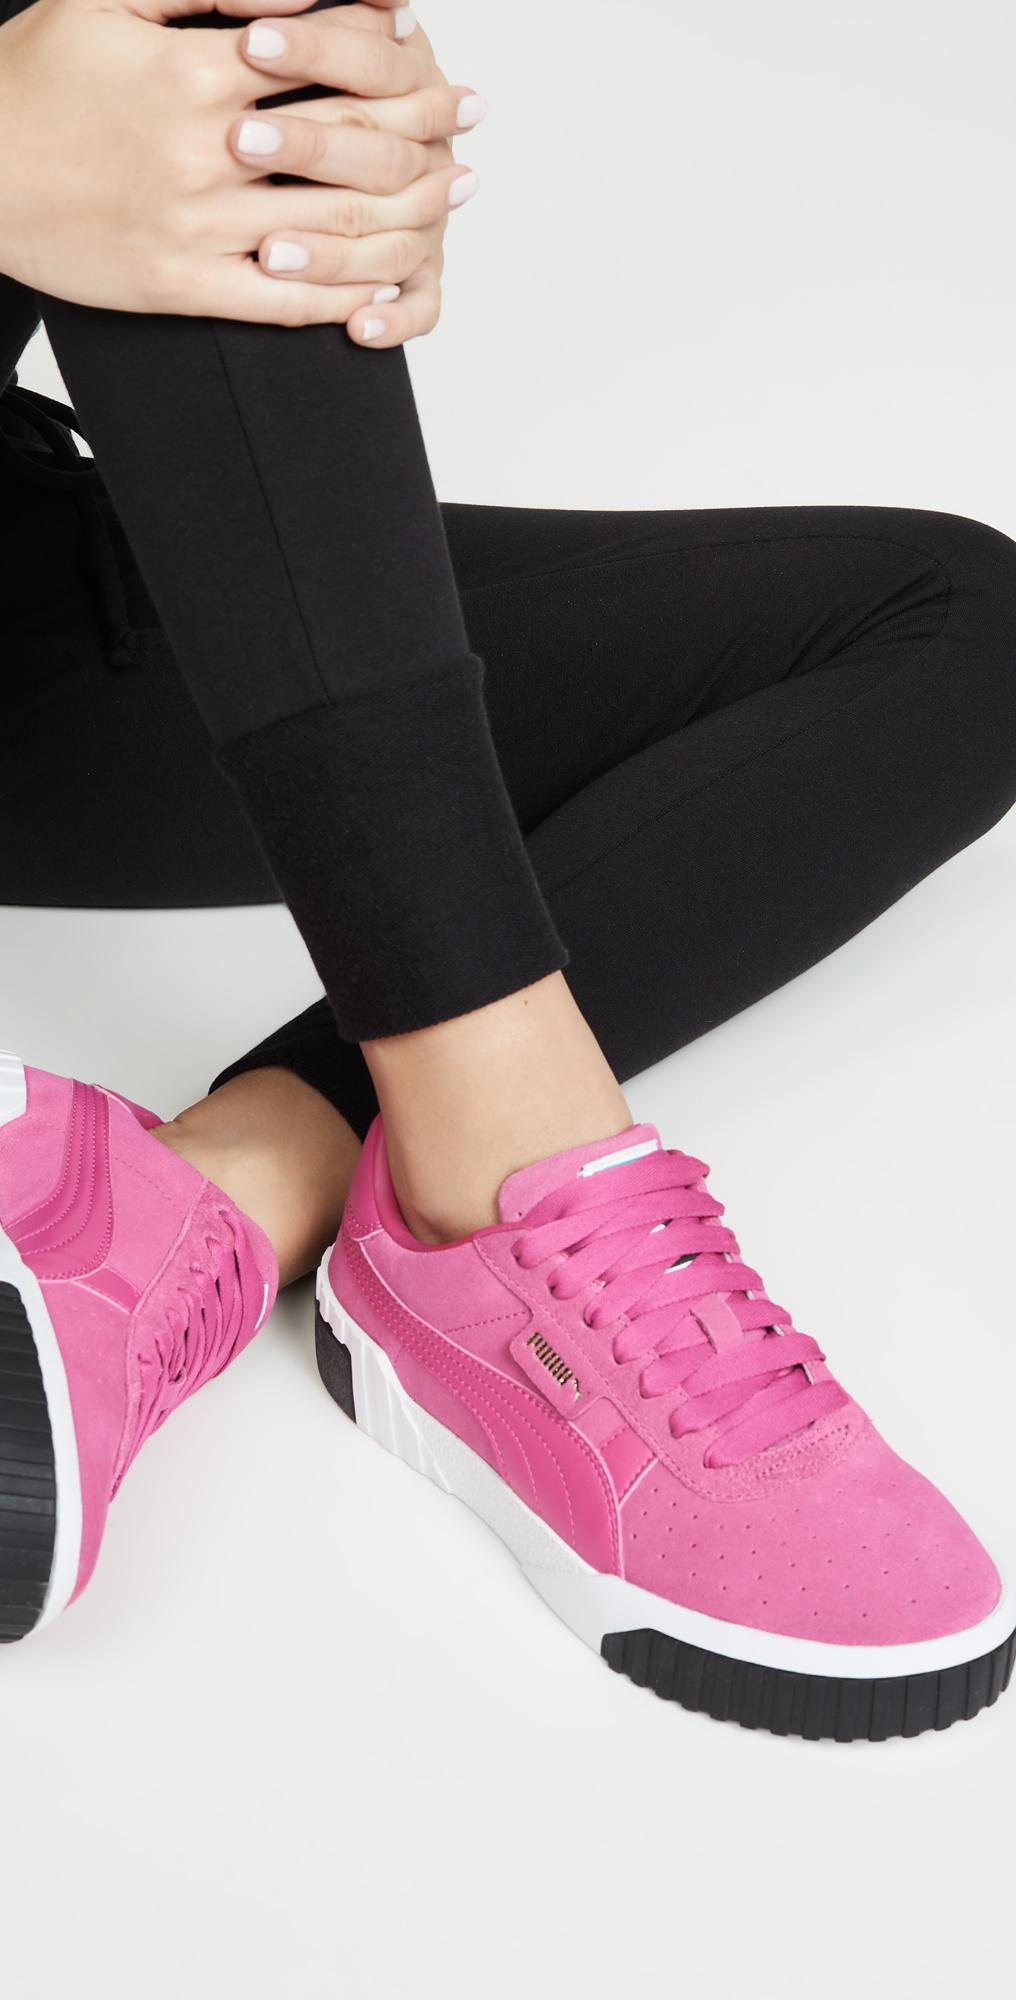 PUMA Cali Suede Sneakers   SHOPBOP